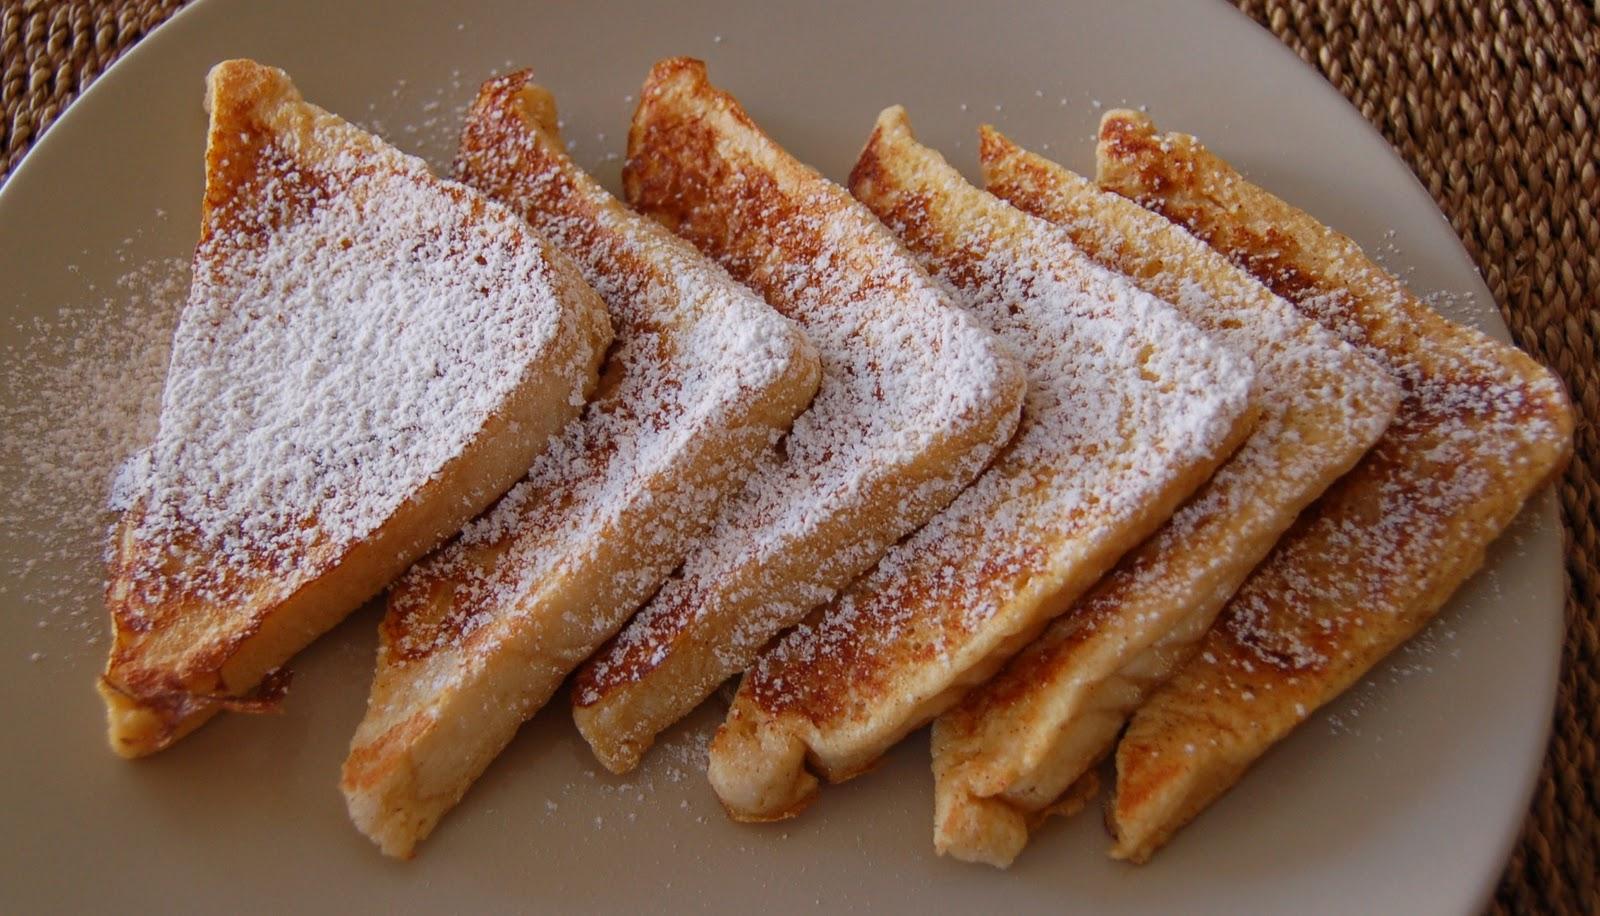 Beb sweet french toast o tostadas francesas for Entradas francesas faciles